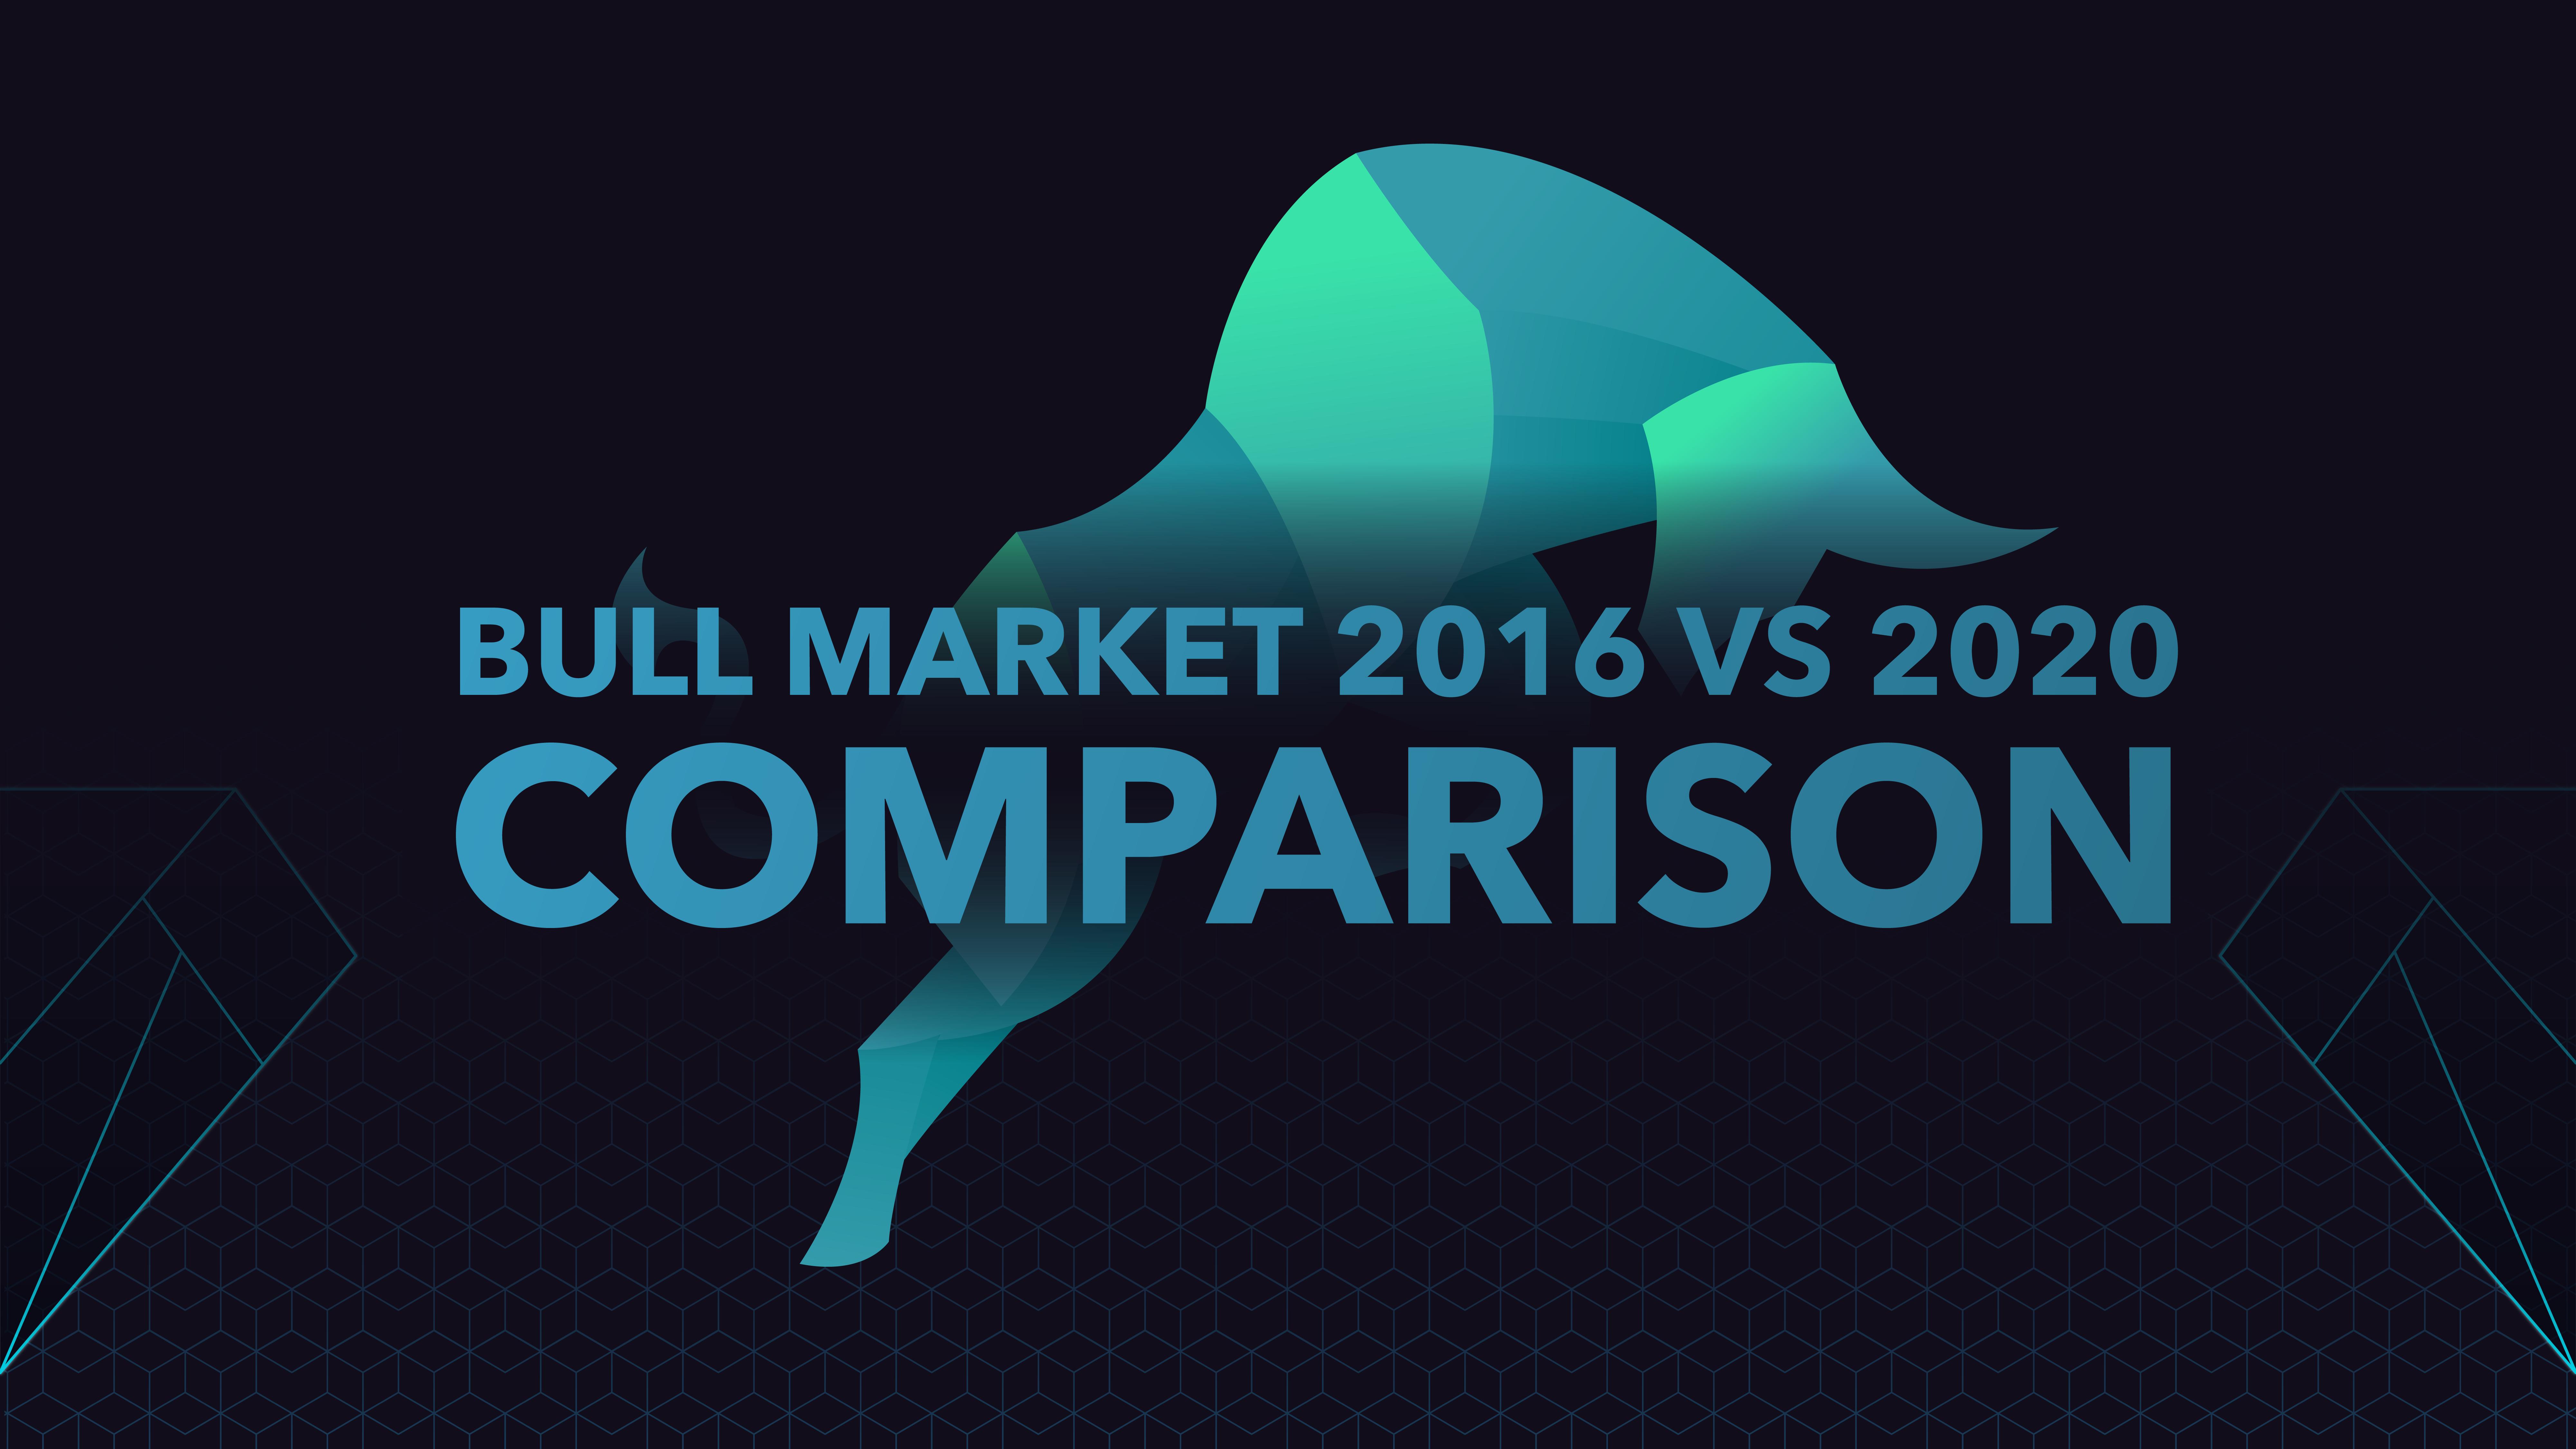 /bitcoin-bull-market-comparing-2020-against-2016-hk2e3zkv feature image